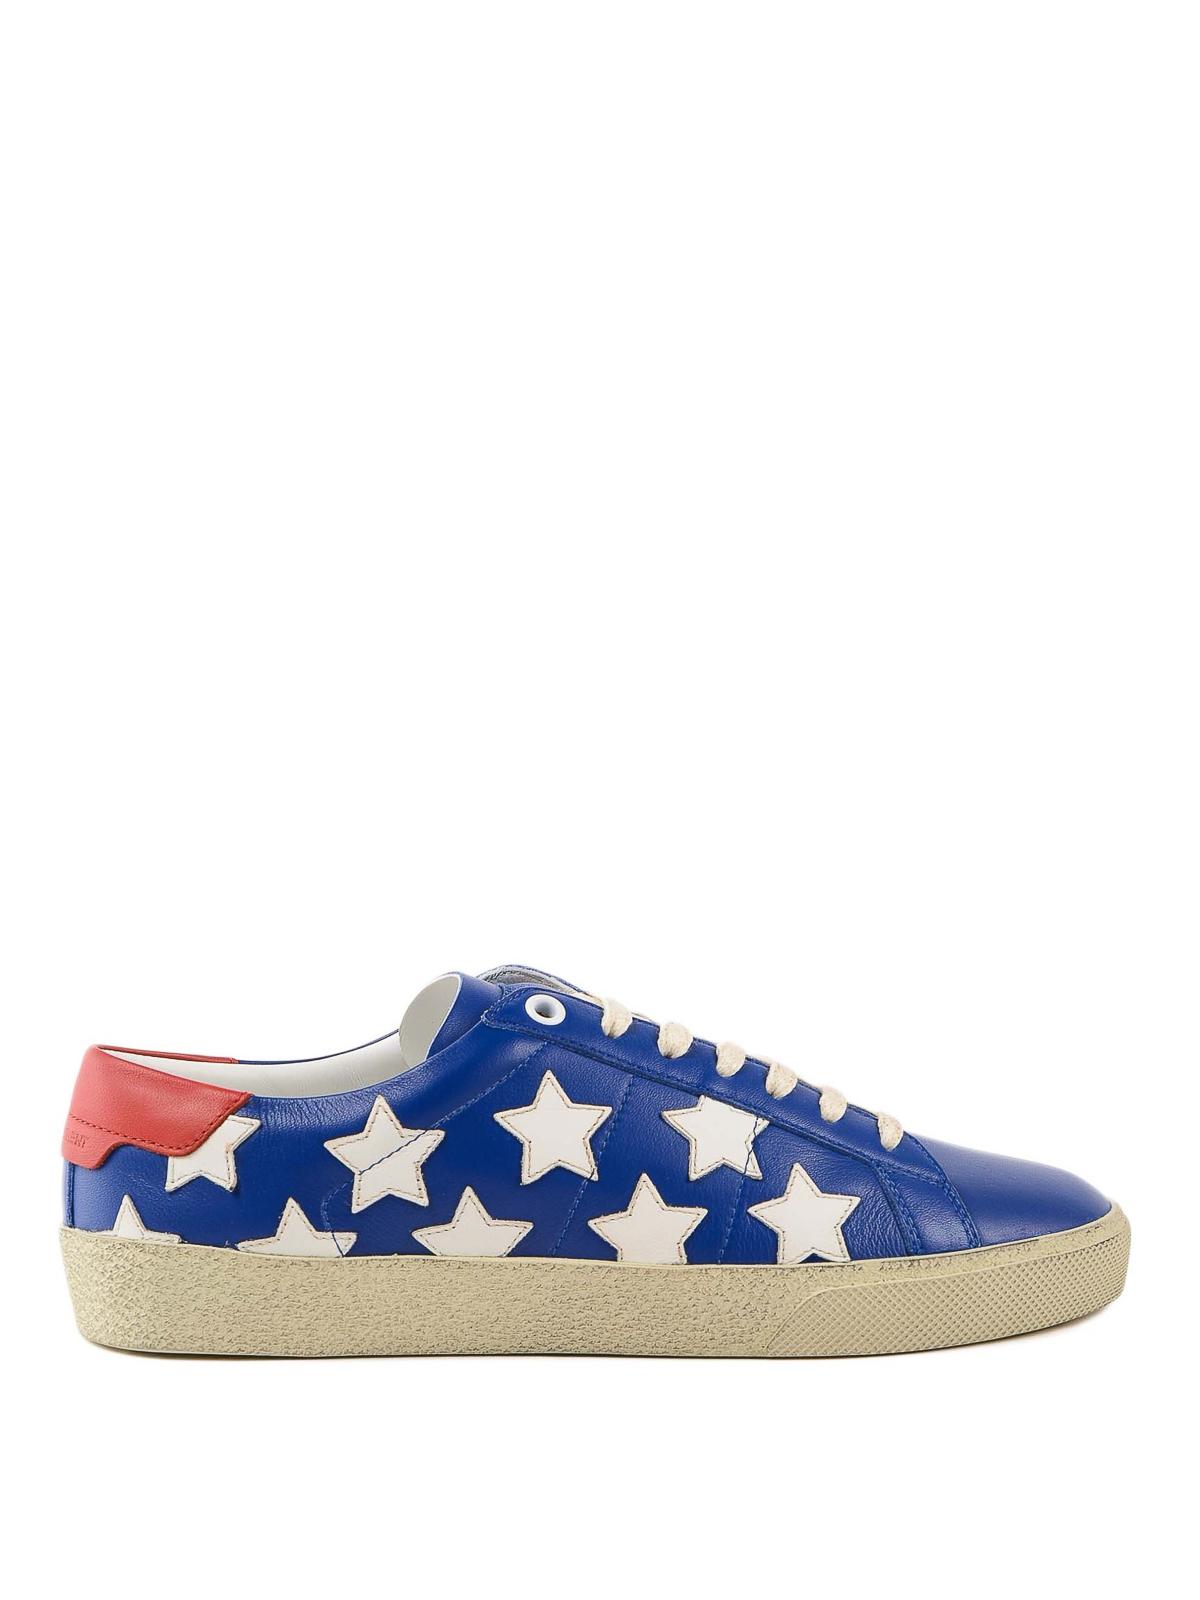 79392a7a854d Saint Laurent - Court Classic white stars blue sneakers - trainers ...